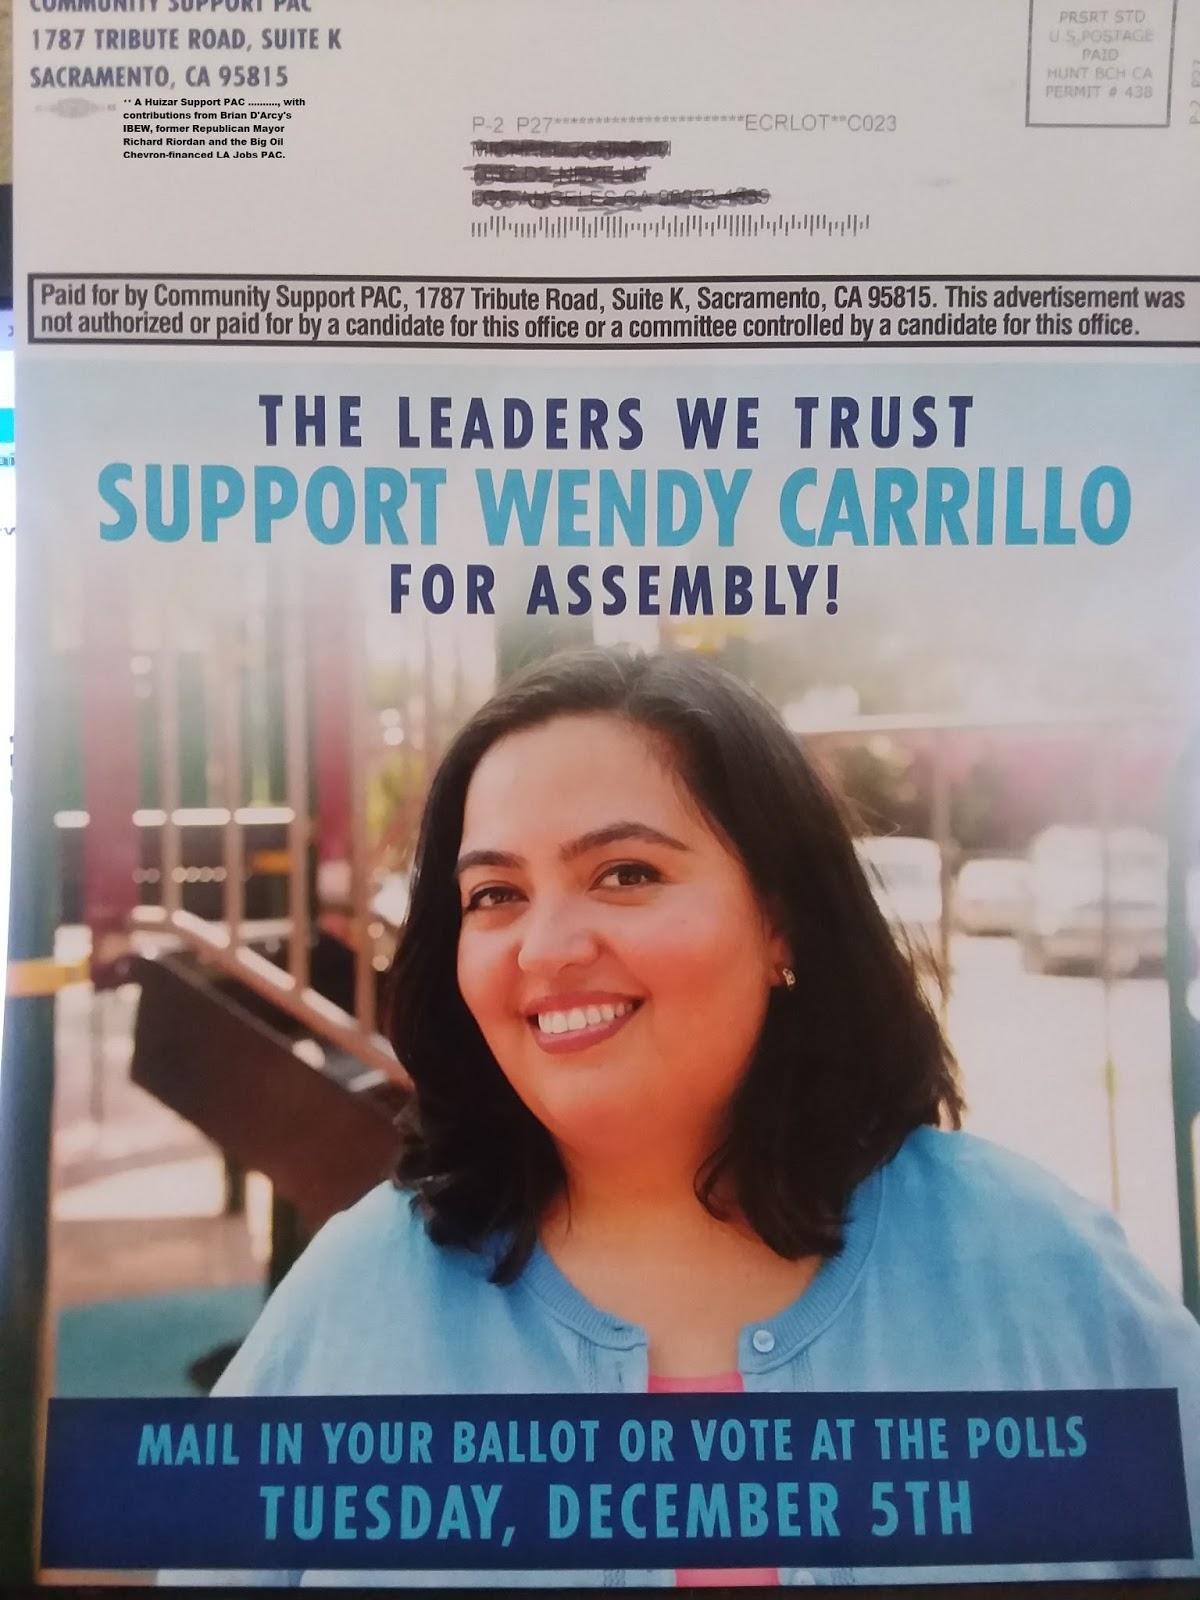 Mayor Sam's Sister City - Home of Los Angeles Politics: A SPECIAL